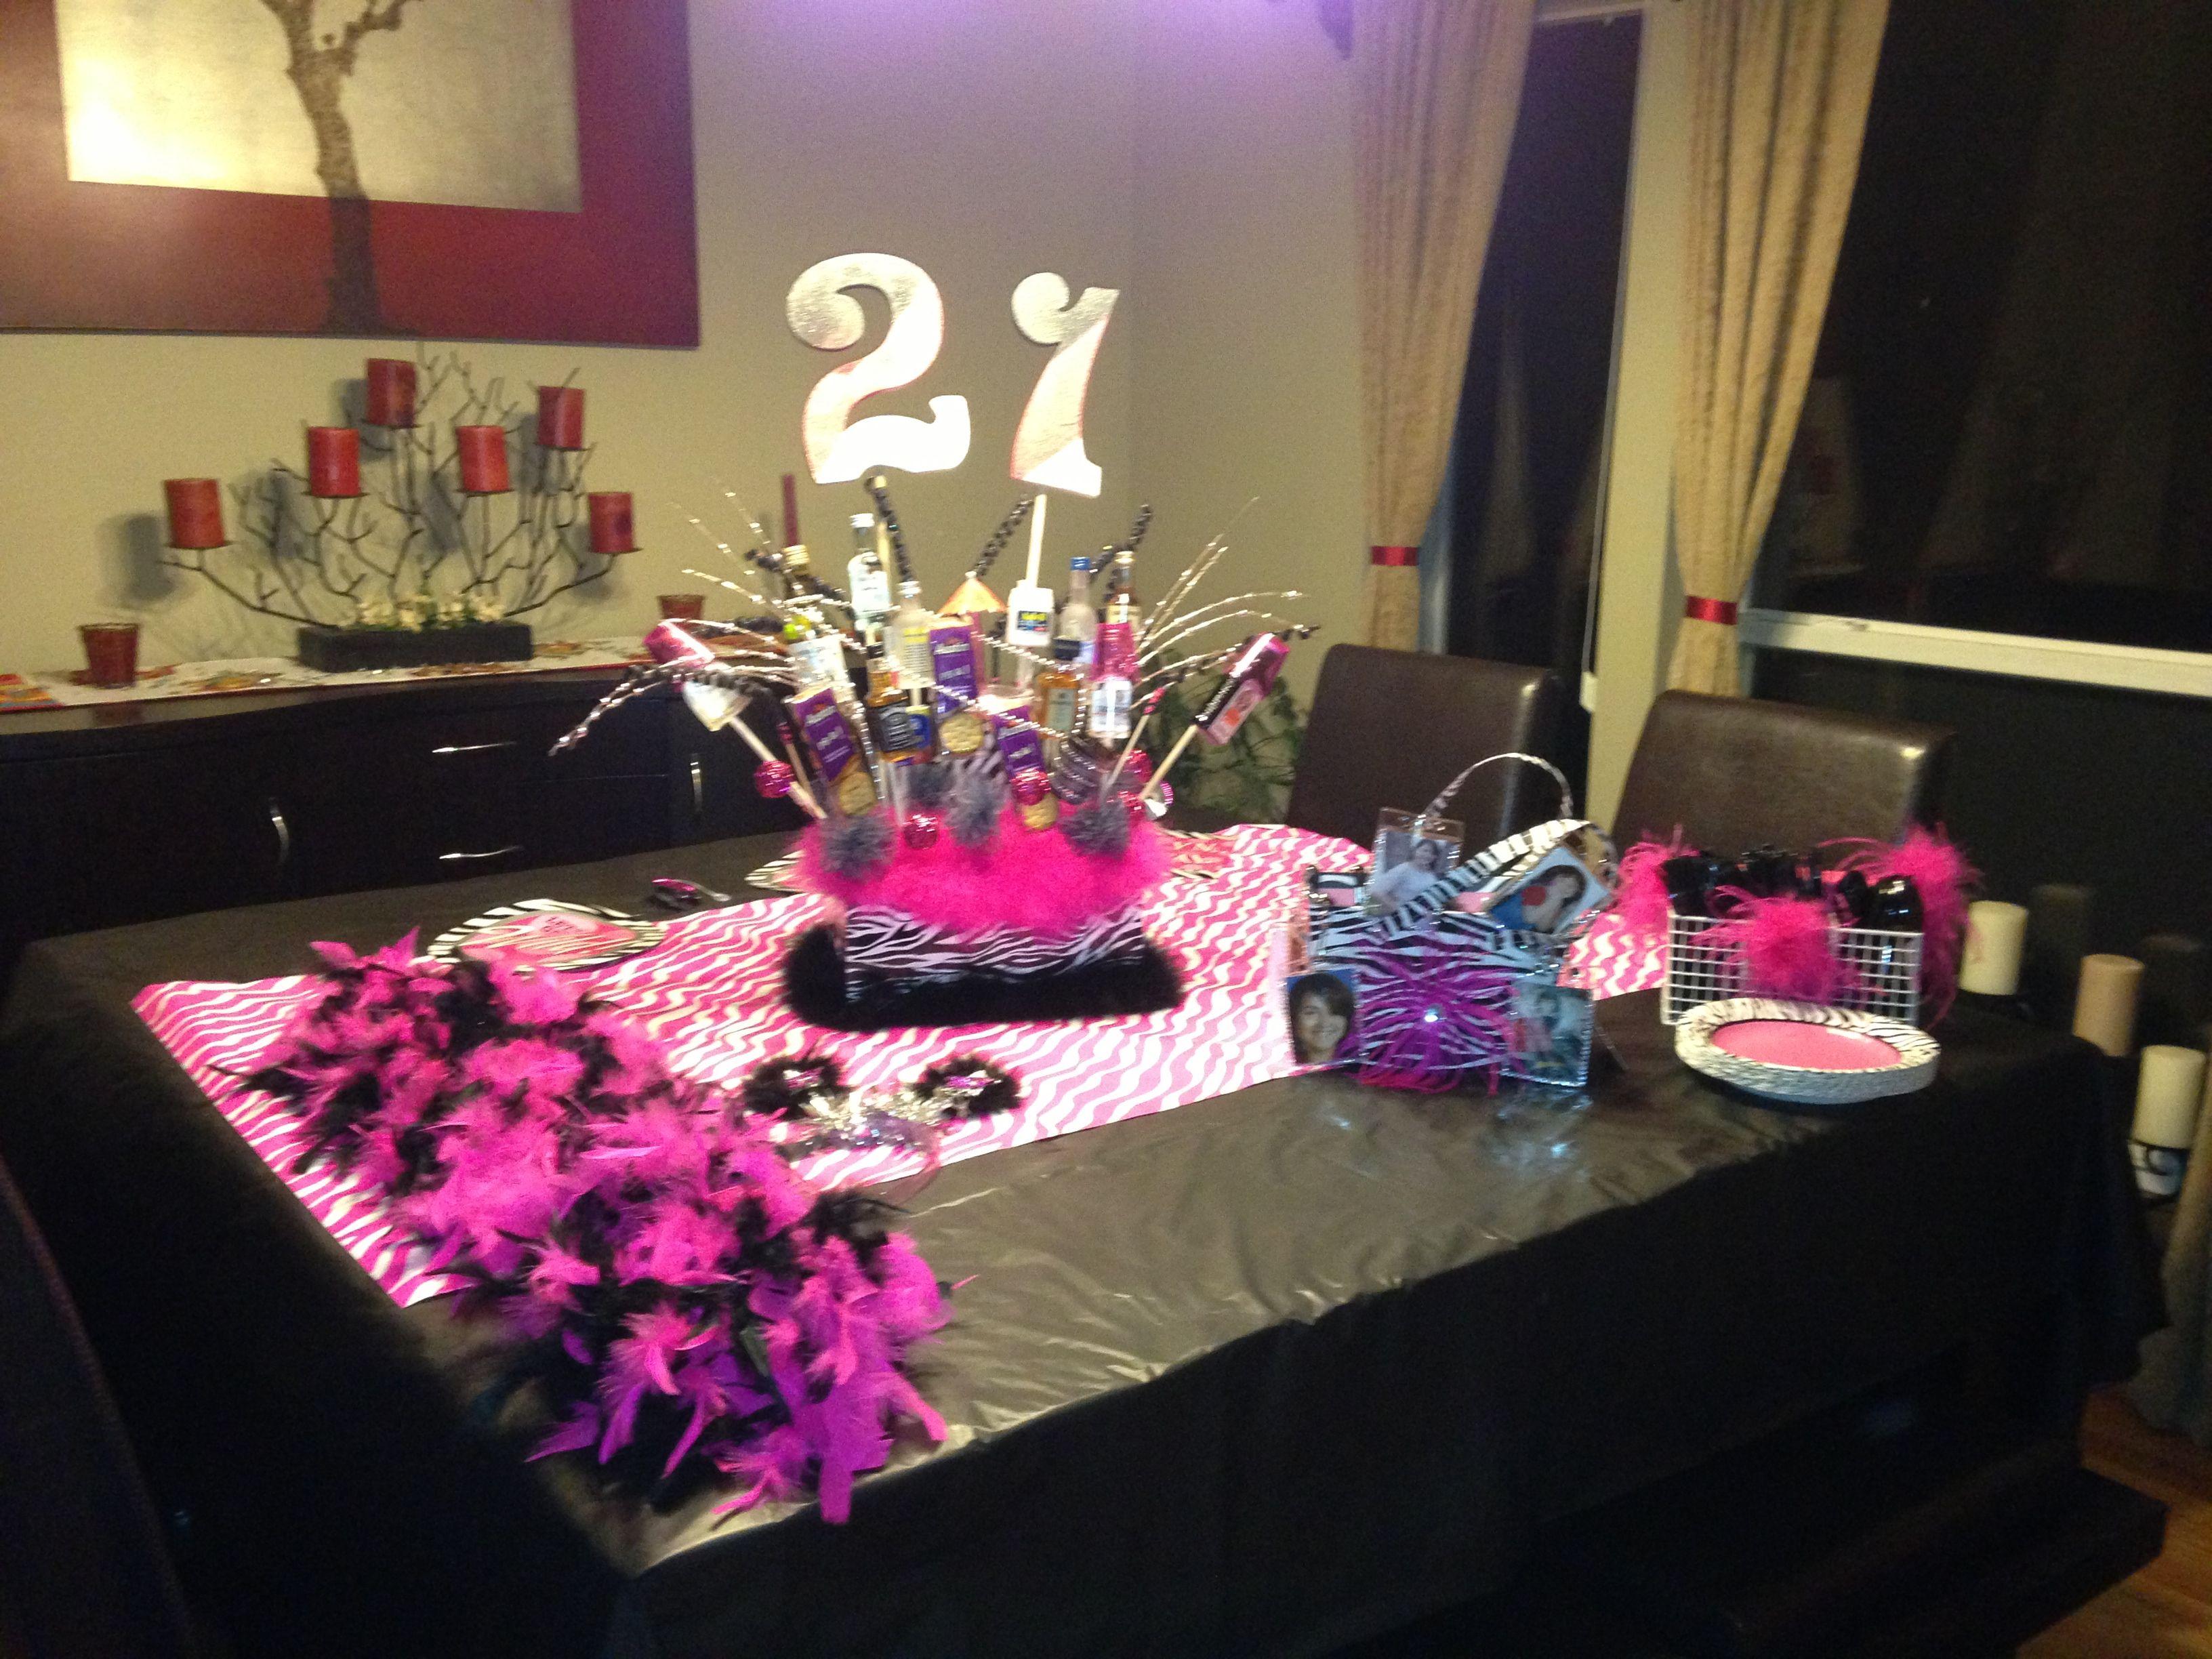 st birthday party table setup also ideas pinterest rh